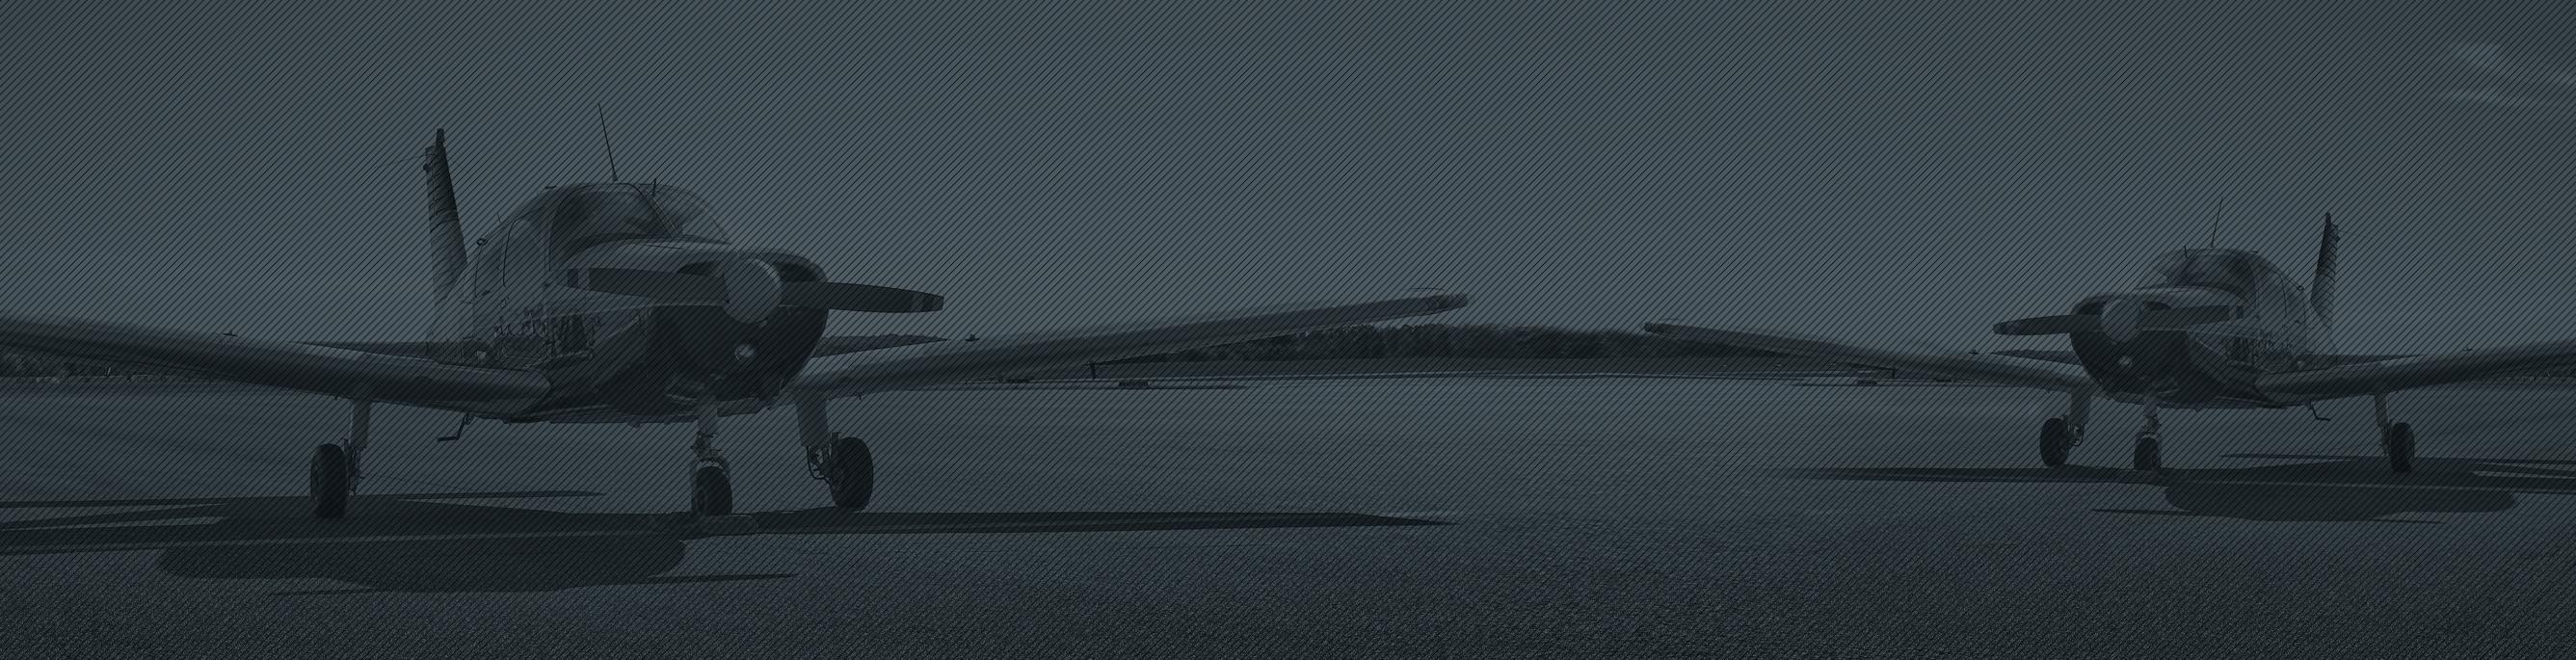 unova_home_banner-plane